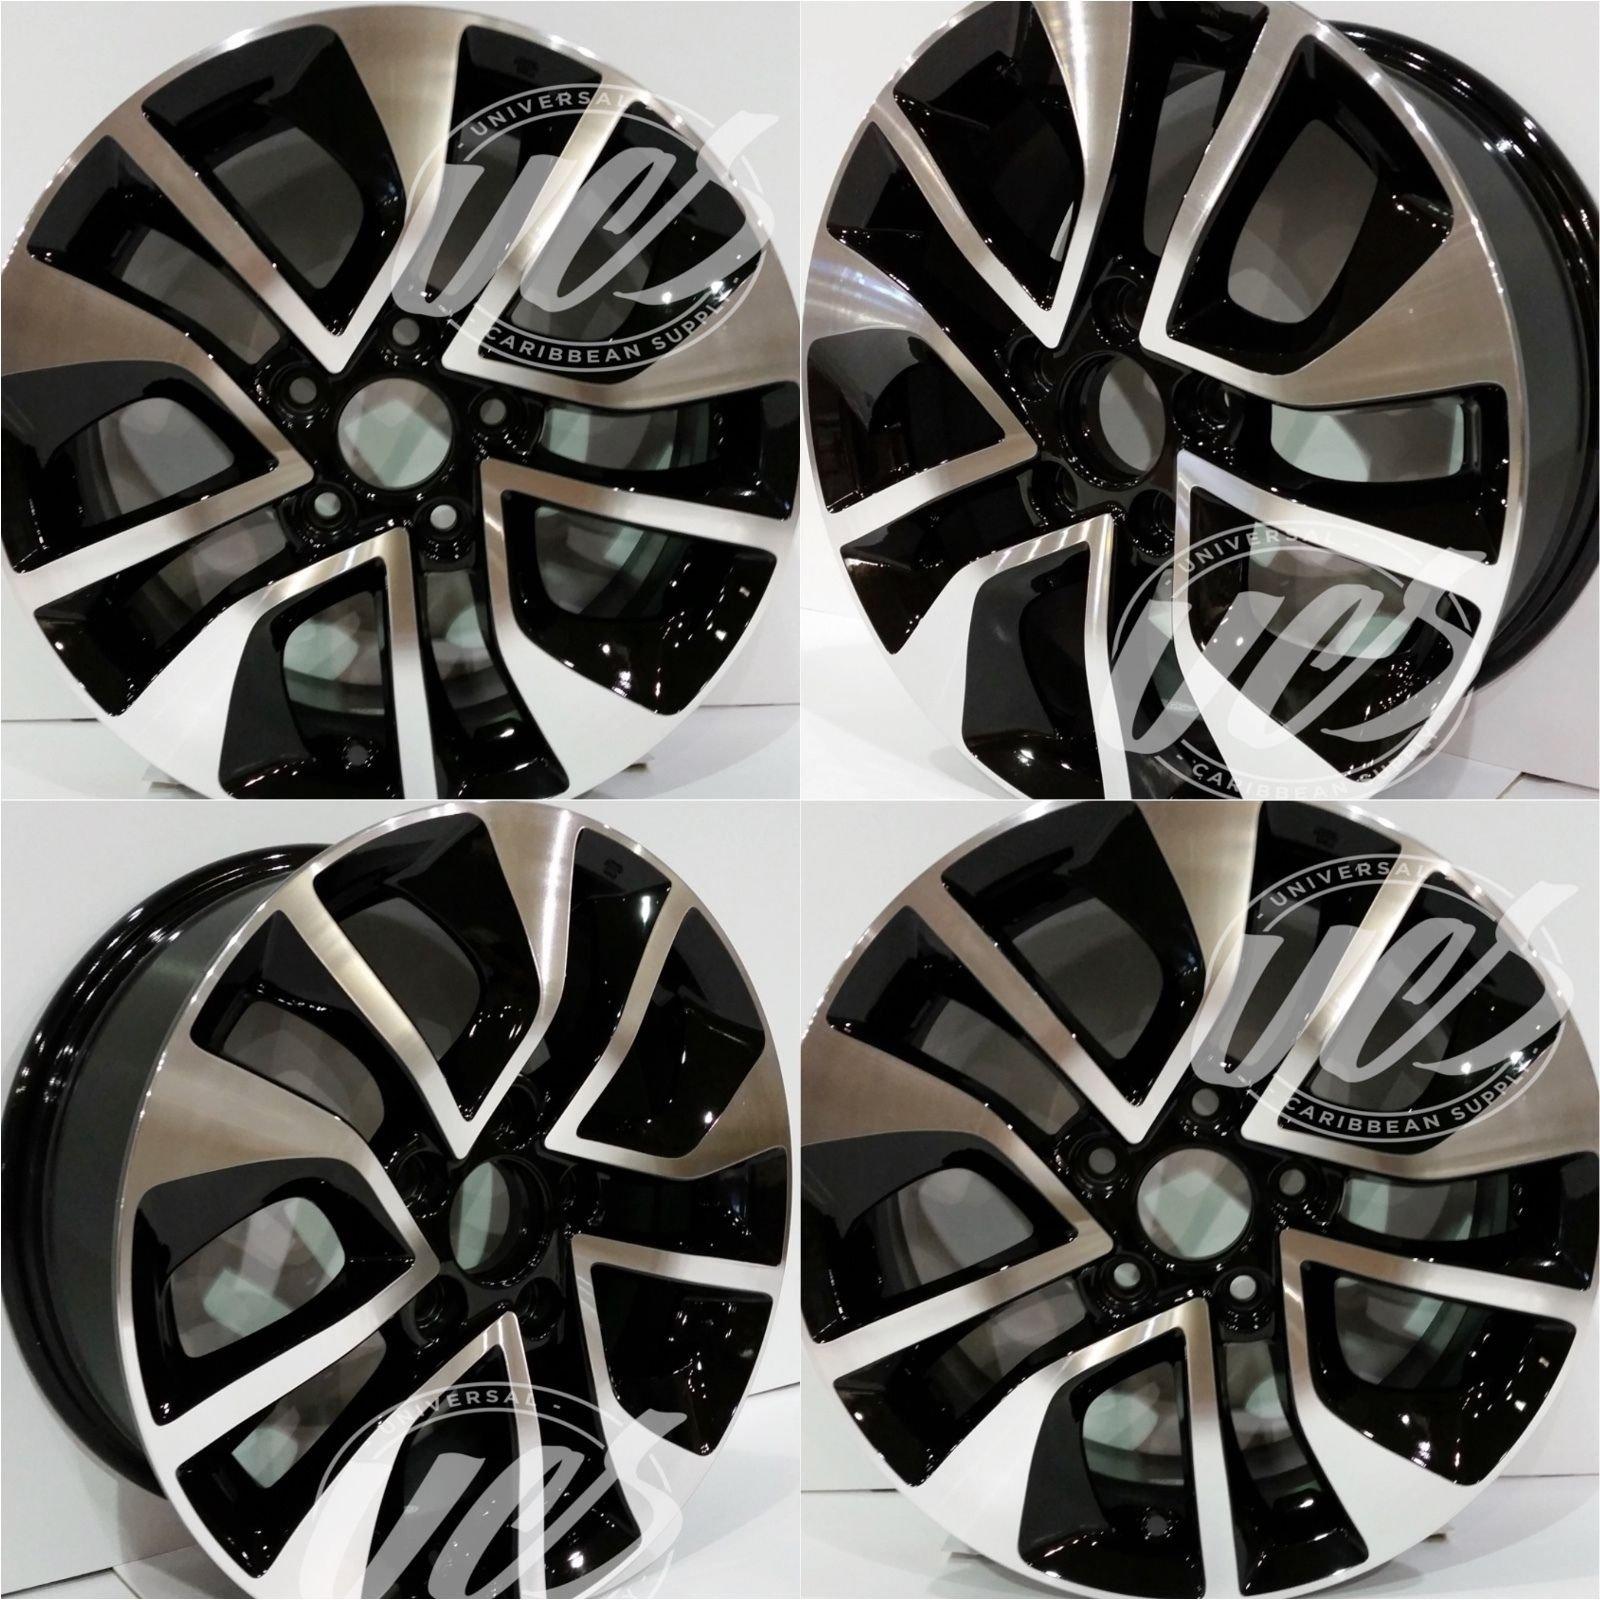 New 16 Inch Alloy Wheels Rims Compatible With Honda Civic 2013 2015 Set Of 4 Pcs Aly64054u45n Buy Online In Bosnia And Herzegovina At Bosnia Desertcart Com Productid 33637385